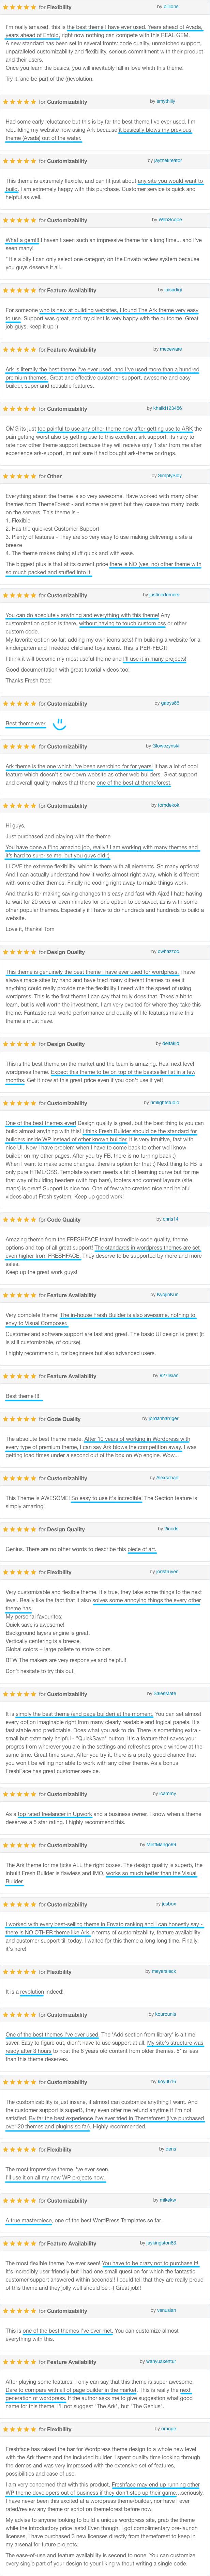 The Ark   WordPress Theme made for Freelancers - 10